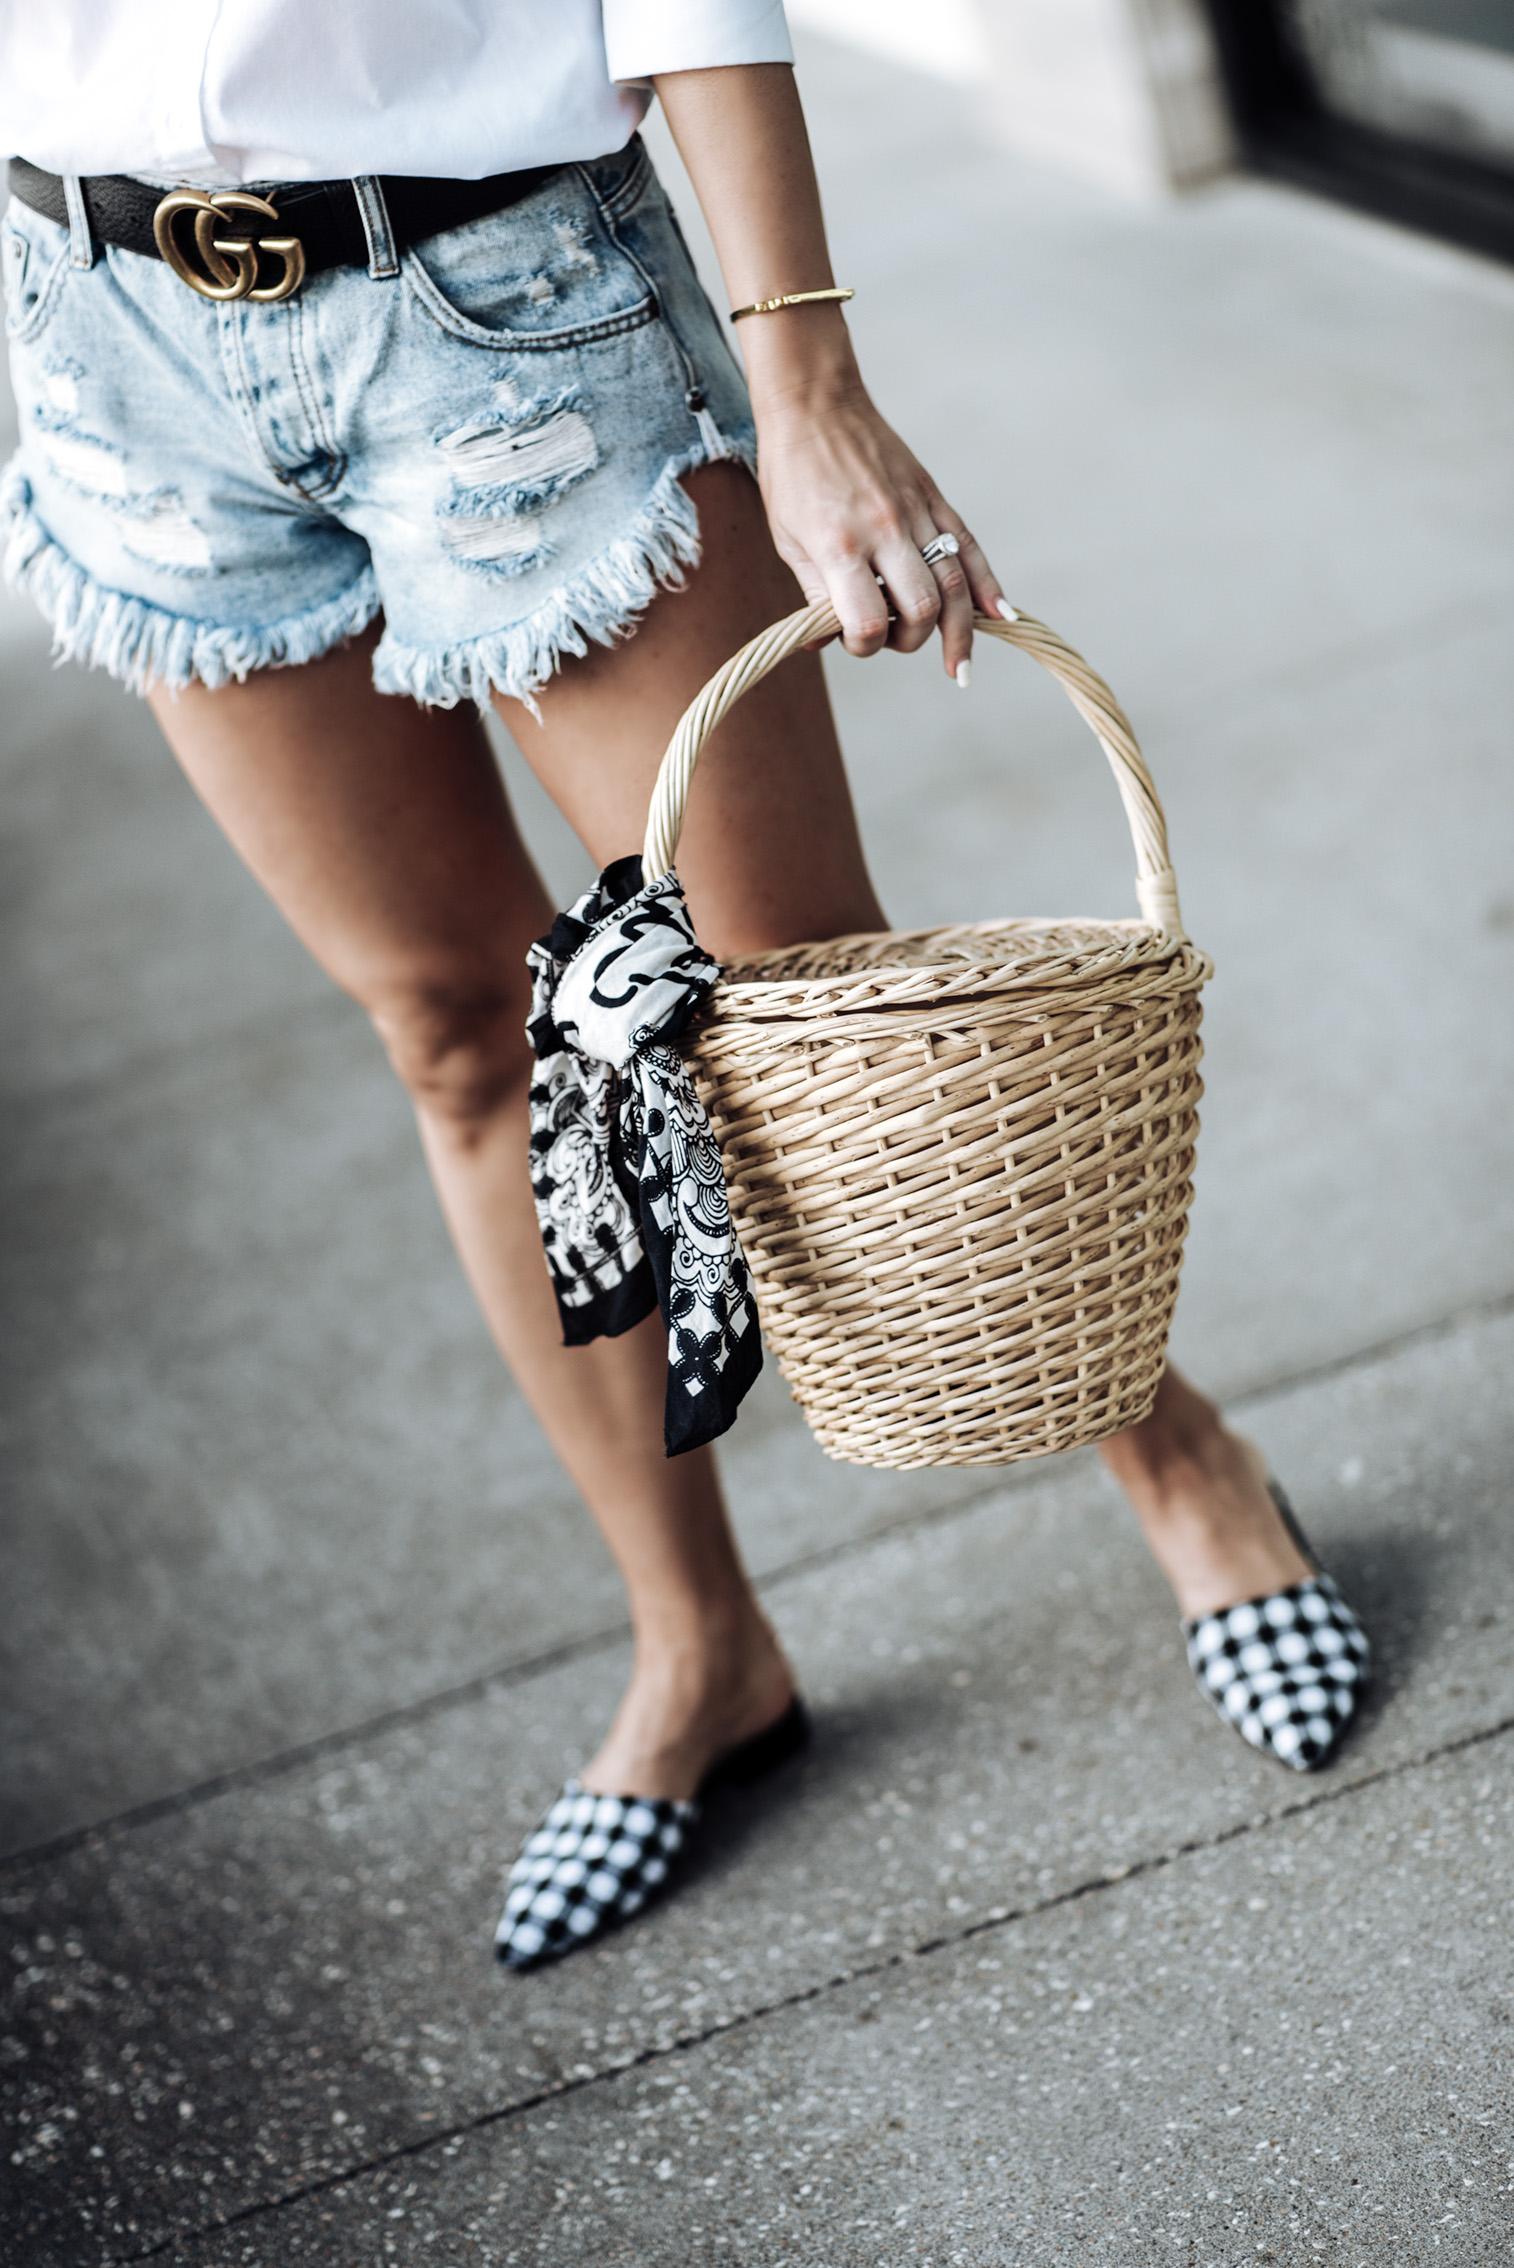 Tiffany Jais Houston fashion blogger   Gucci double g belt   White button down top   One Teaspoon shorts   Straw basket handbag   Streetstyle outfit ideas 2017 Gingham flats